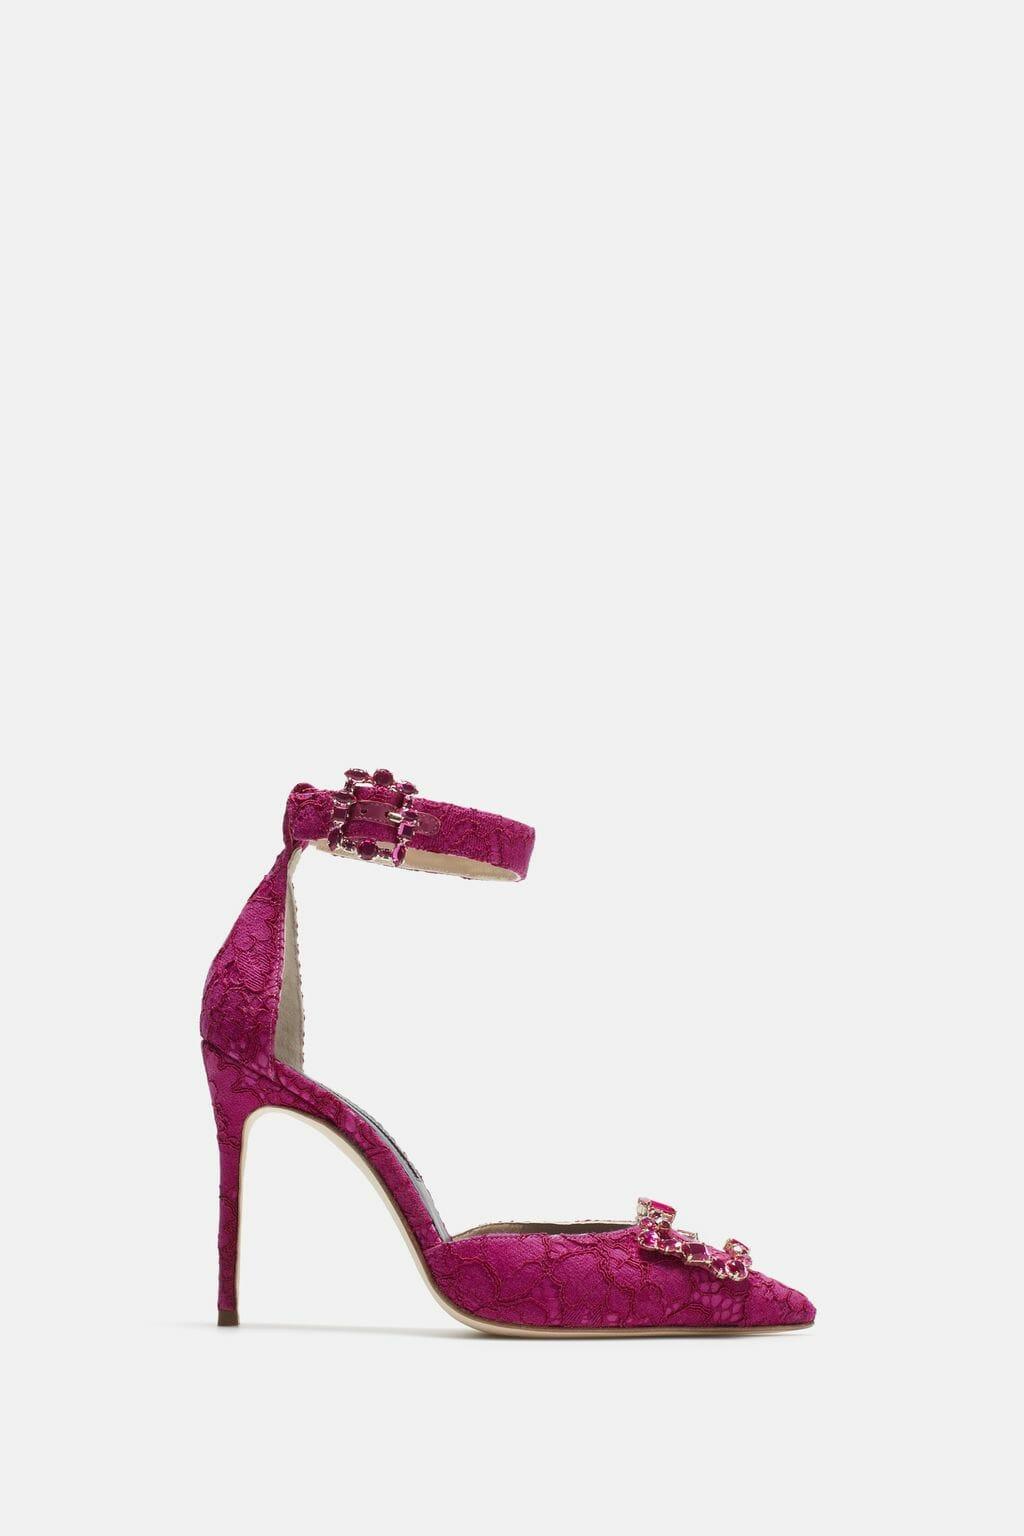 CH-Carolina-herrera-shoes-collection-Spring-Summer-2018-shoe-20